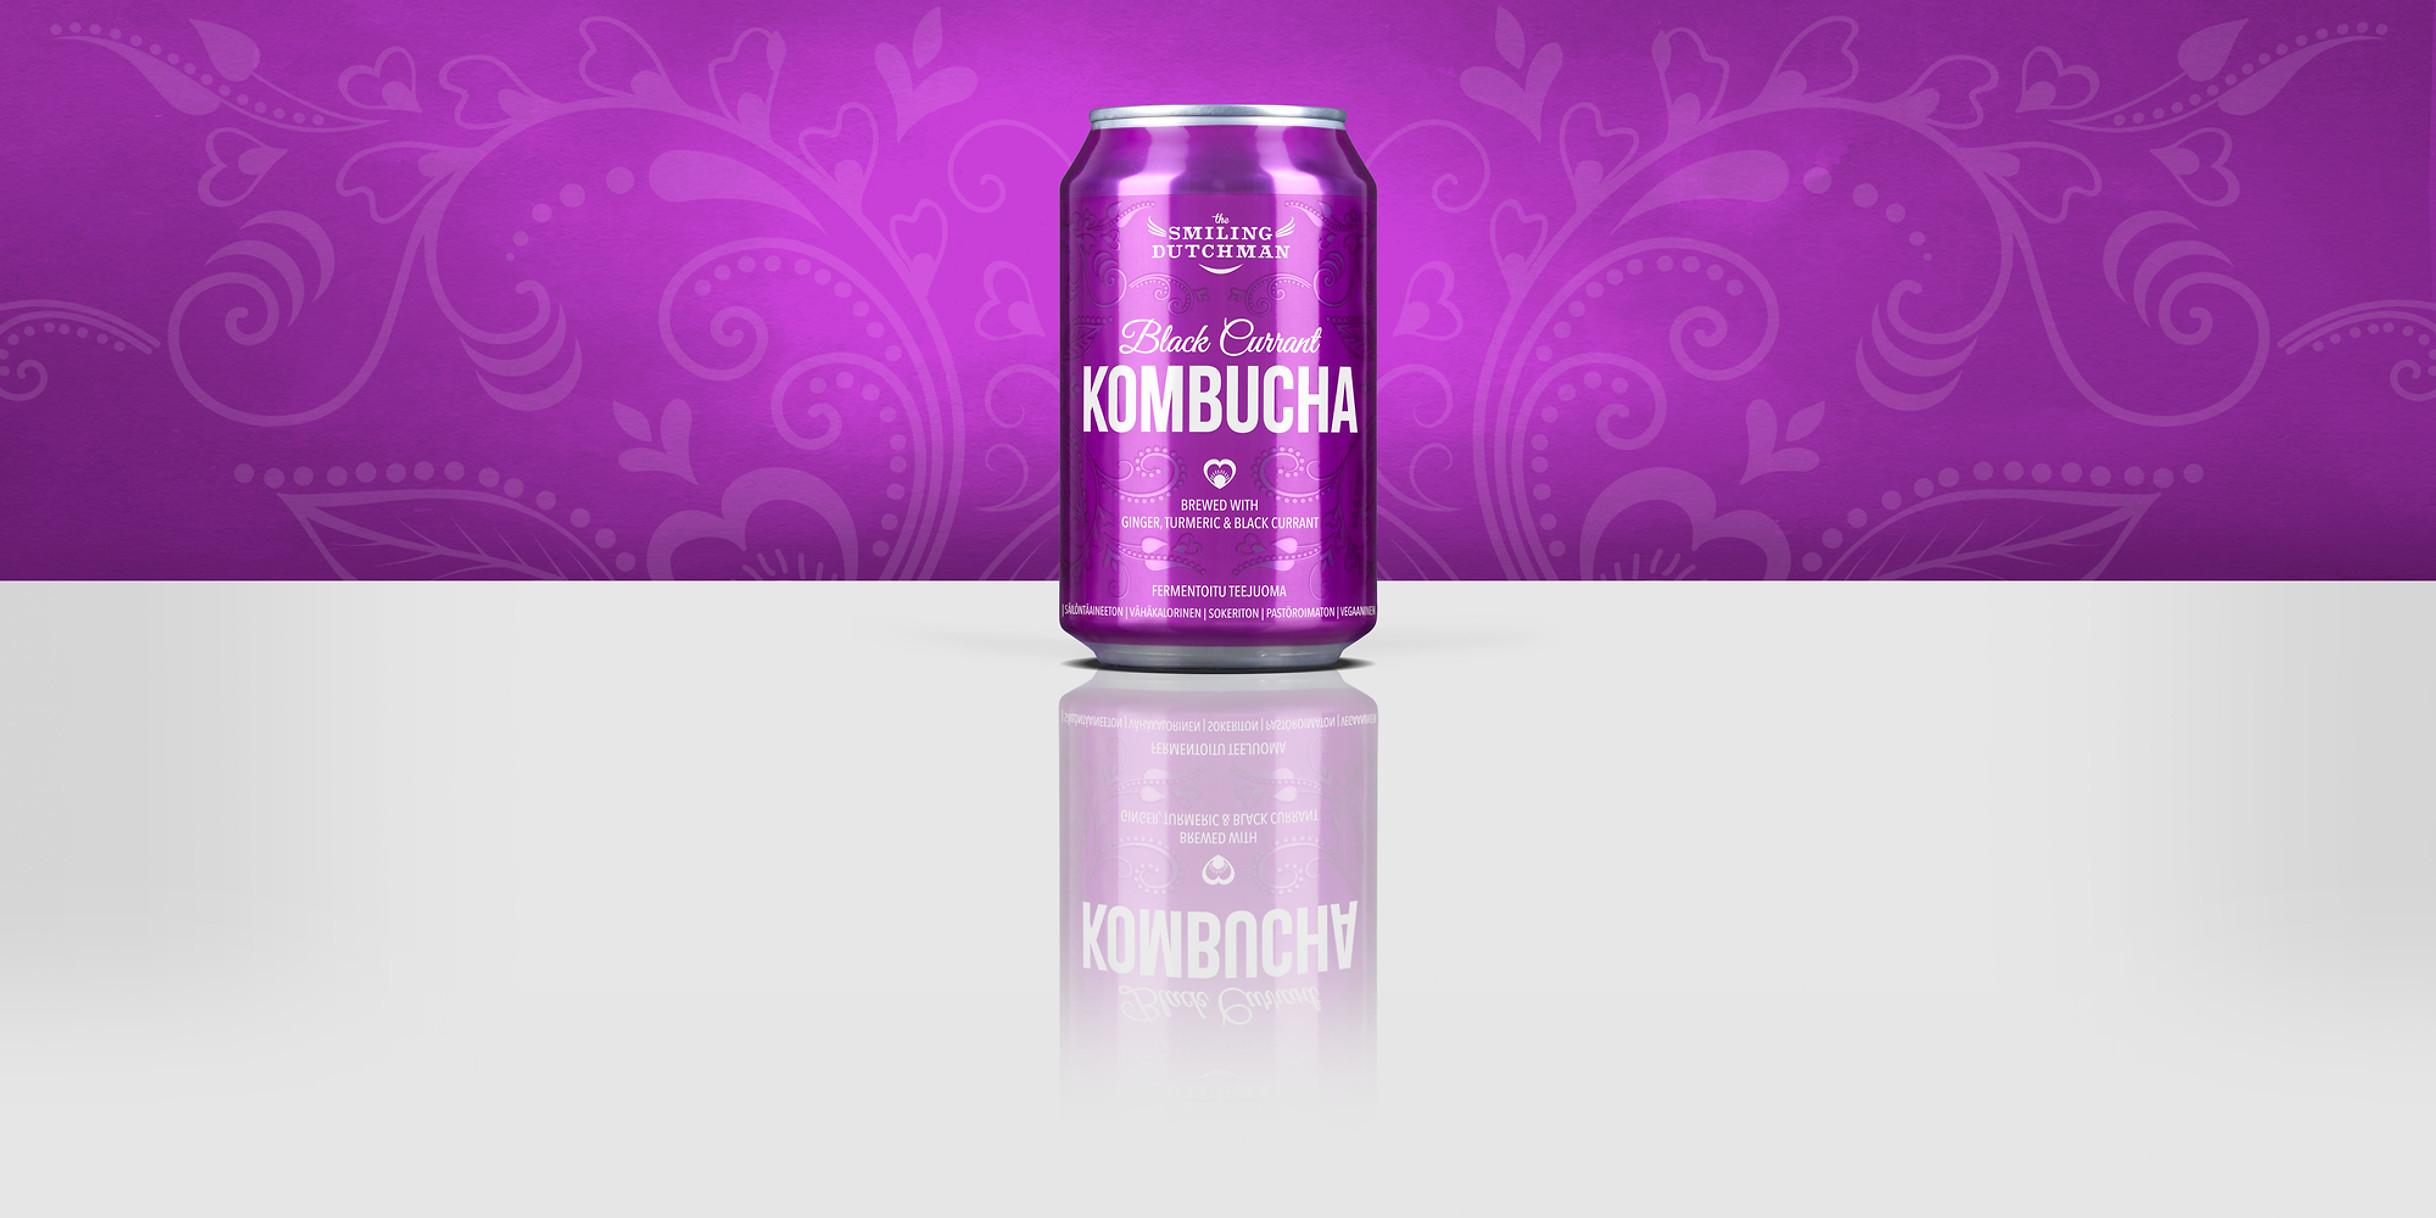 The Smiling Ductman Kombucha filled in a 33 cl can. Sugar-free Kombucha